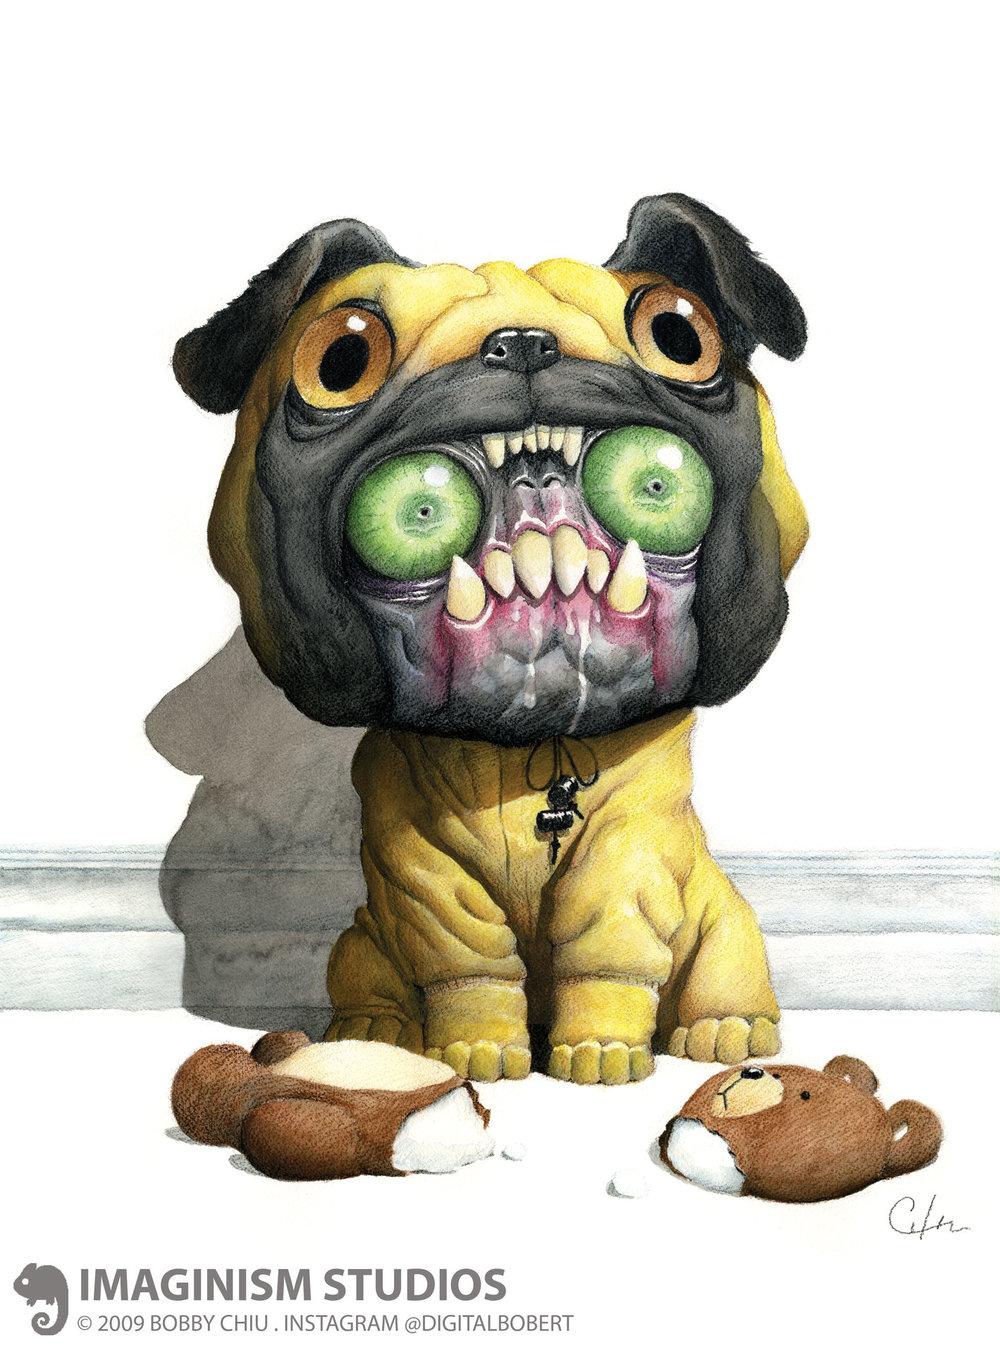 bobby_chiu_fablehatch_digital_artist_illustration_0032.jpg